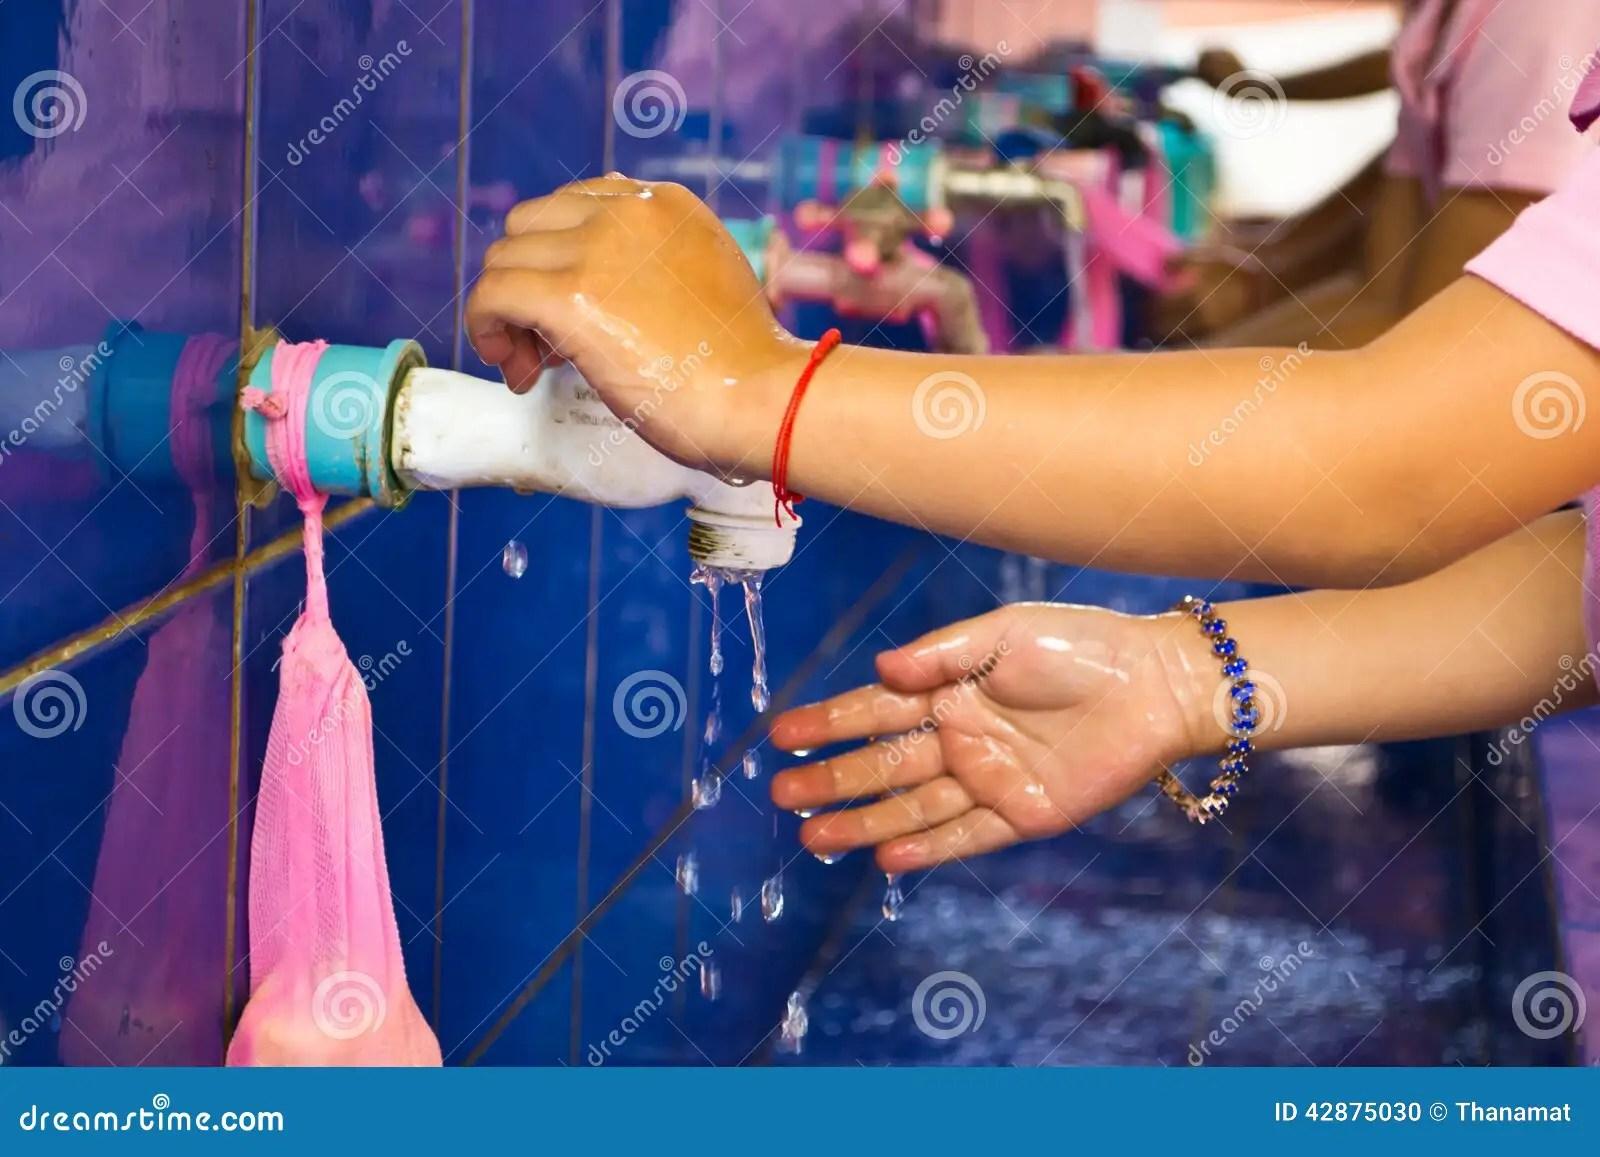 Handwashing Teachers That Schools Are Teaching Children